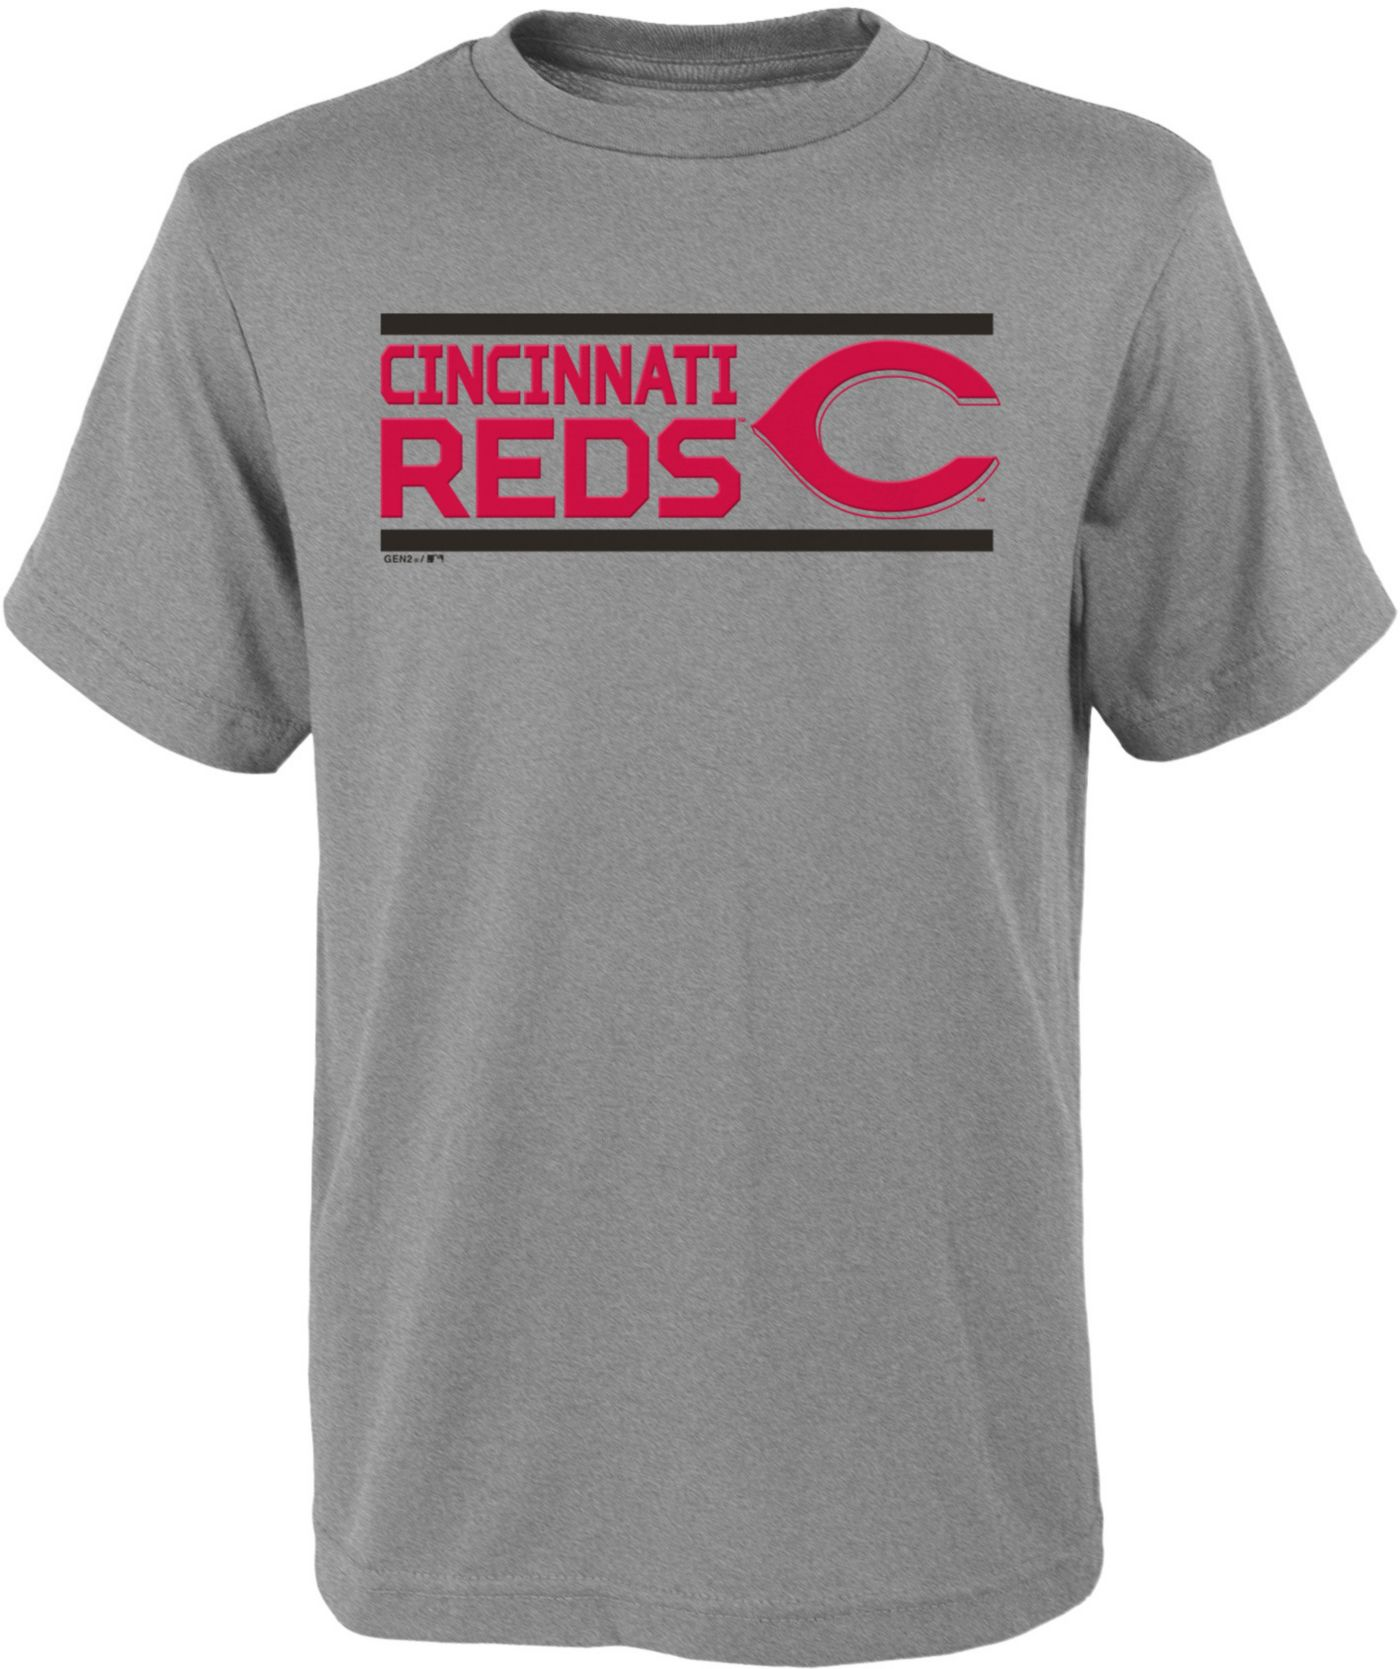 Gen2 Youth Cincinnati Reds Dri-Tek Grey T-Shirt